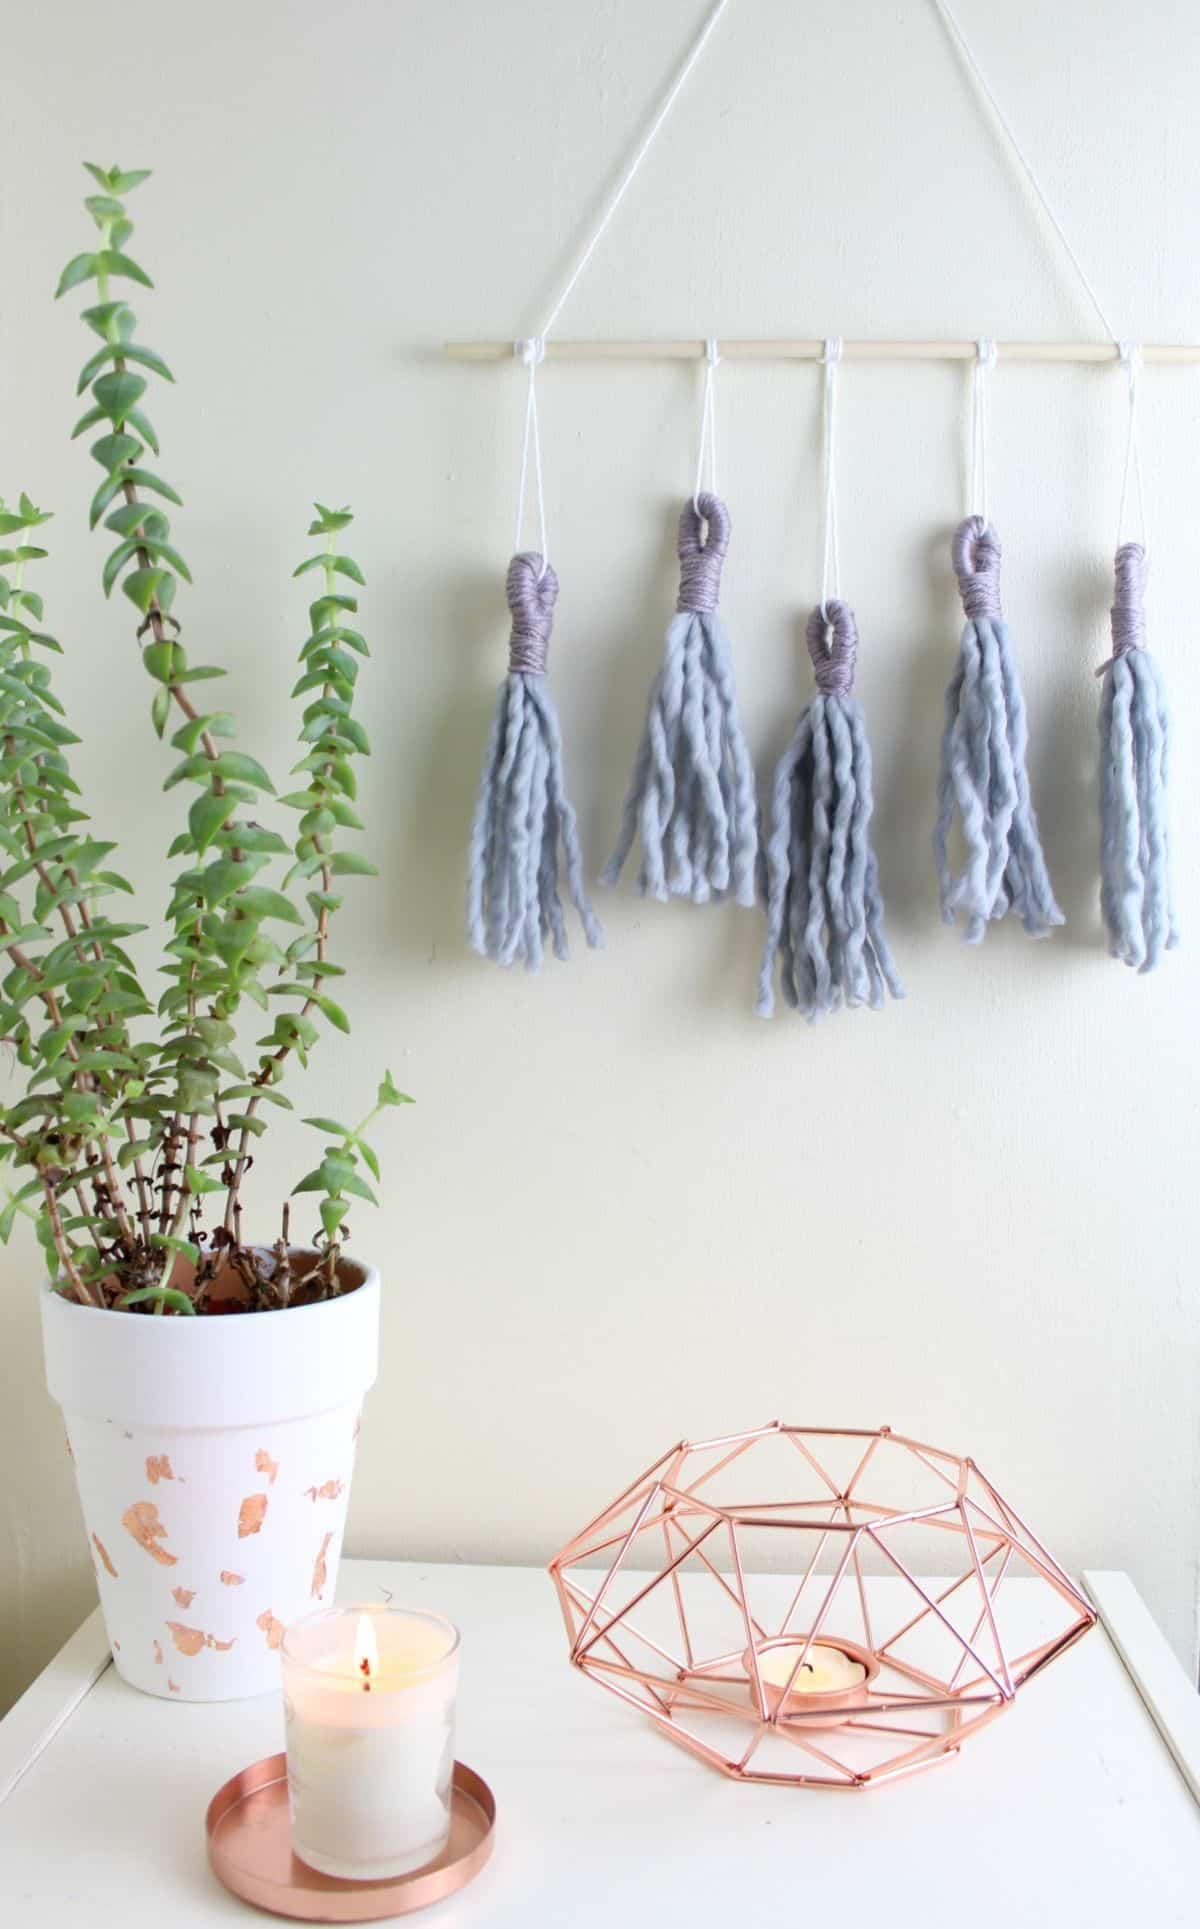 Simpler jumbo tassel wall hanging